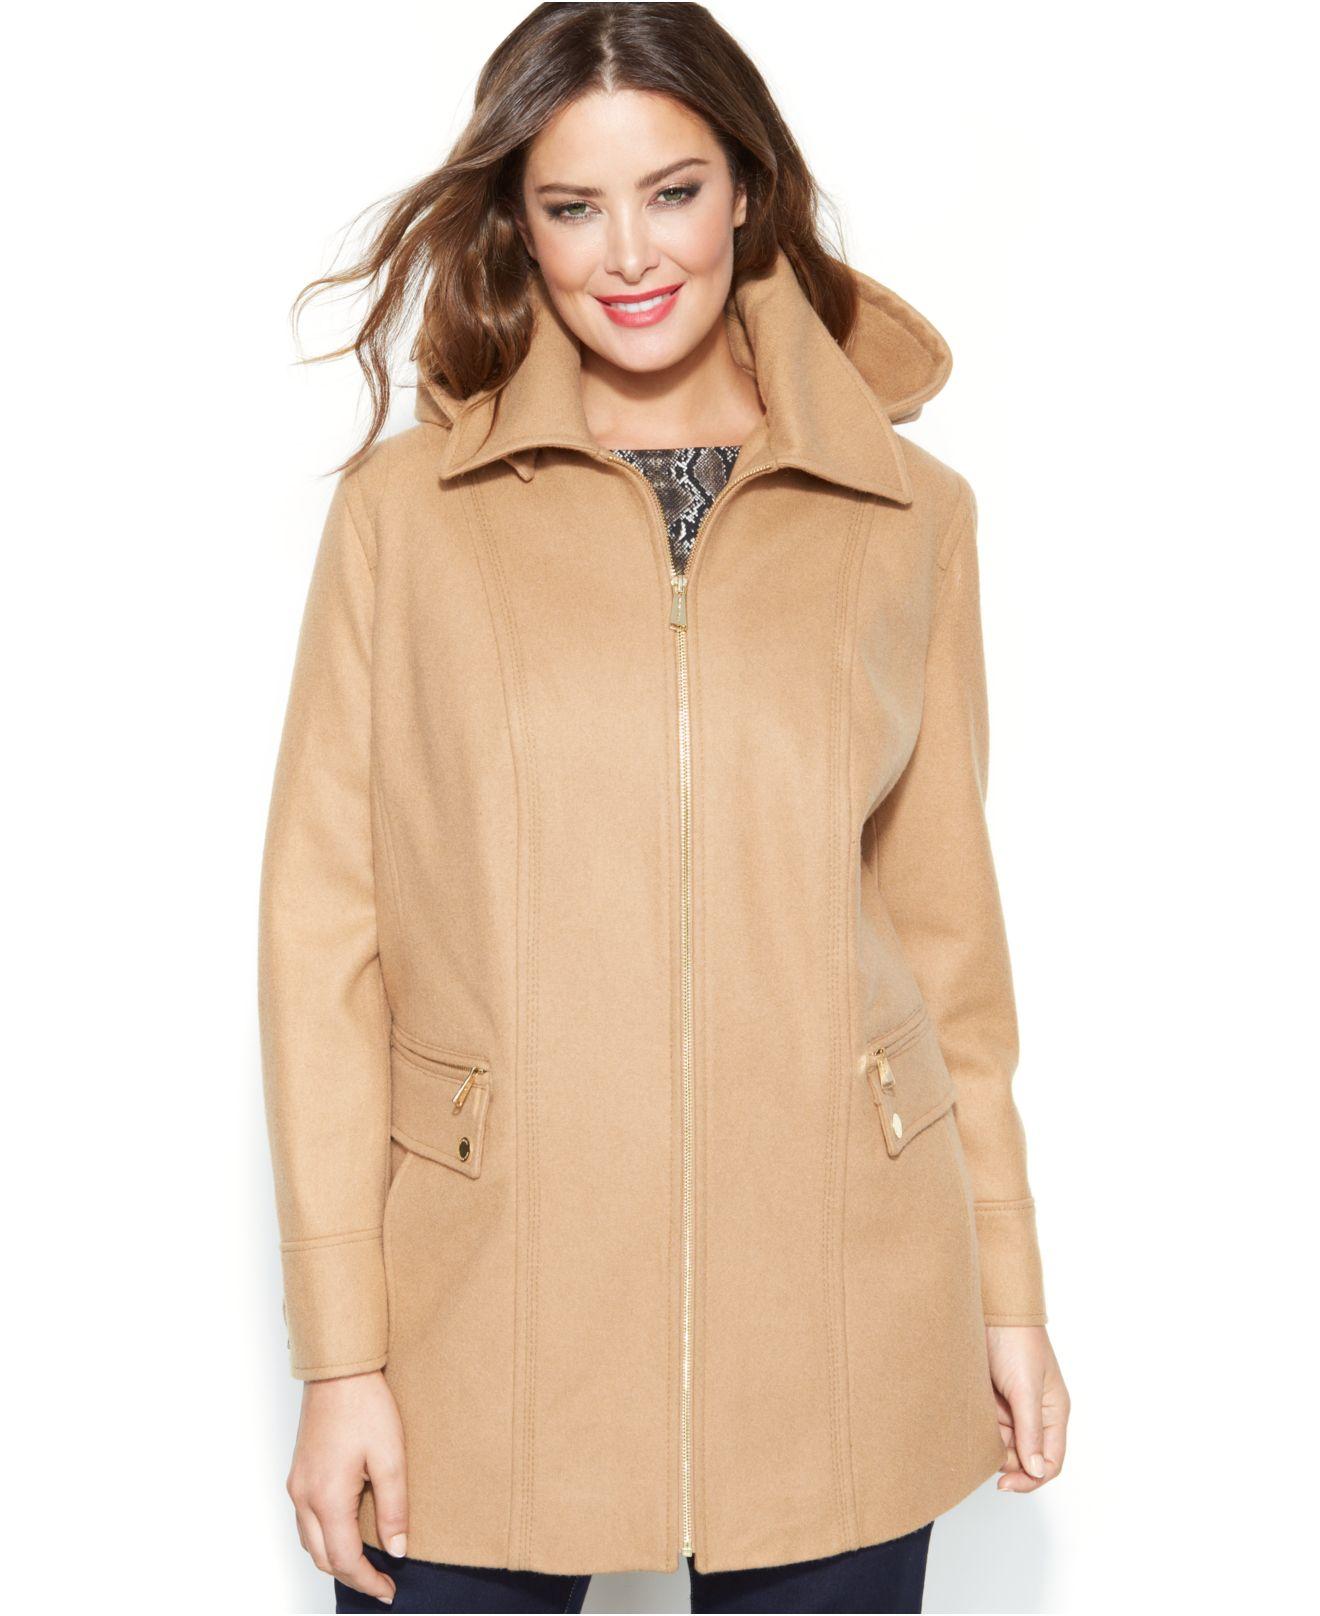 45d0d1e08c177 Lyst - Michael Kors Michael Plus Size Wool-Blend Hooded Coat in Natural